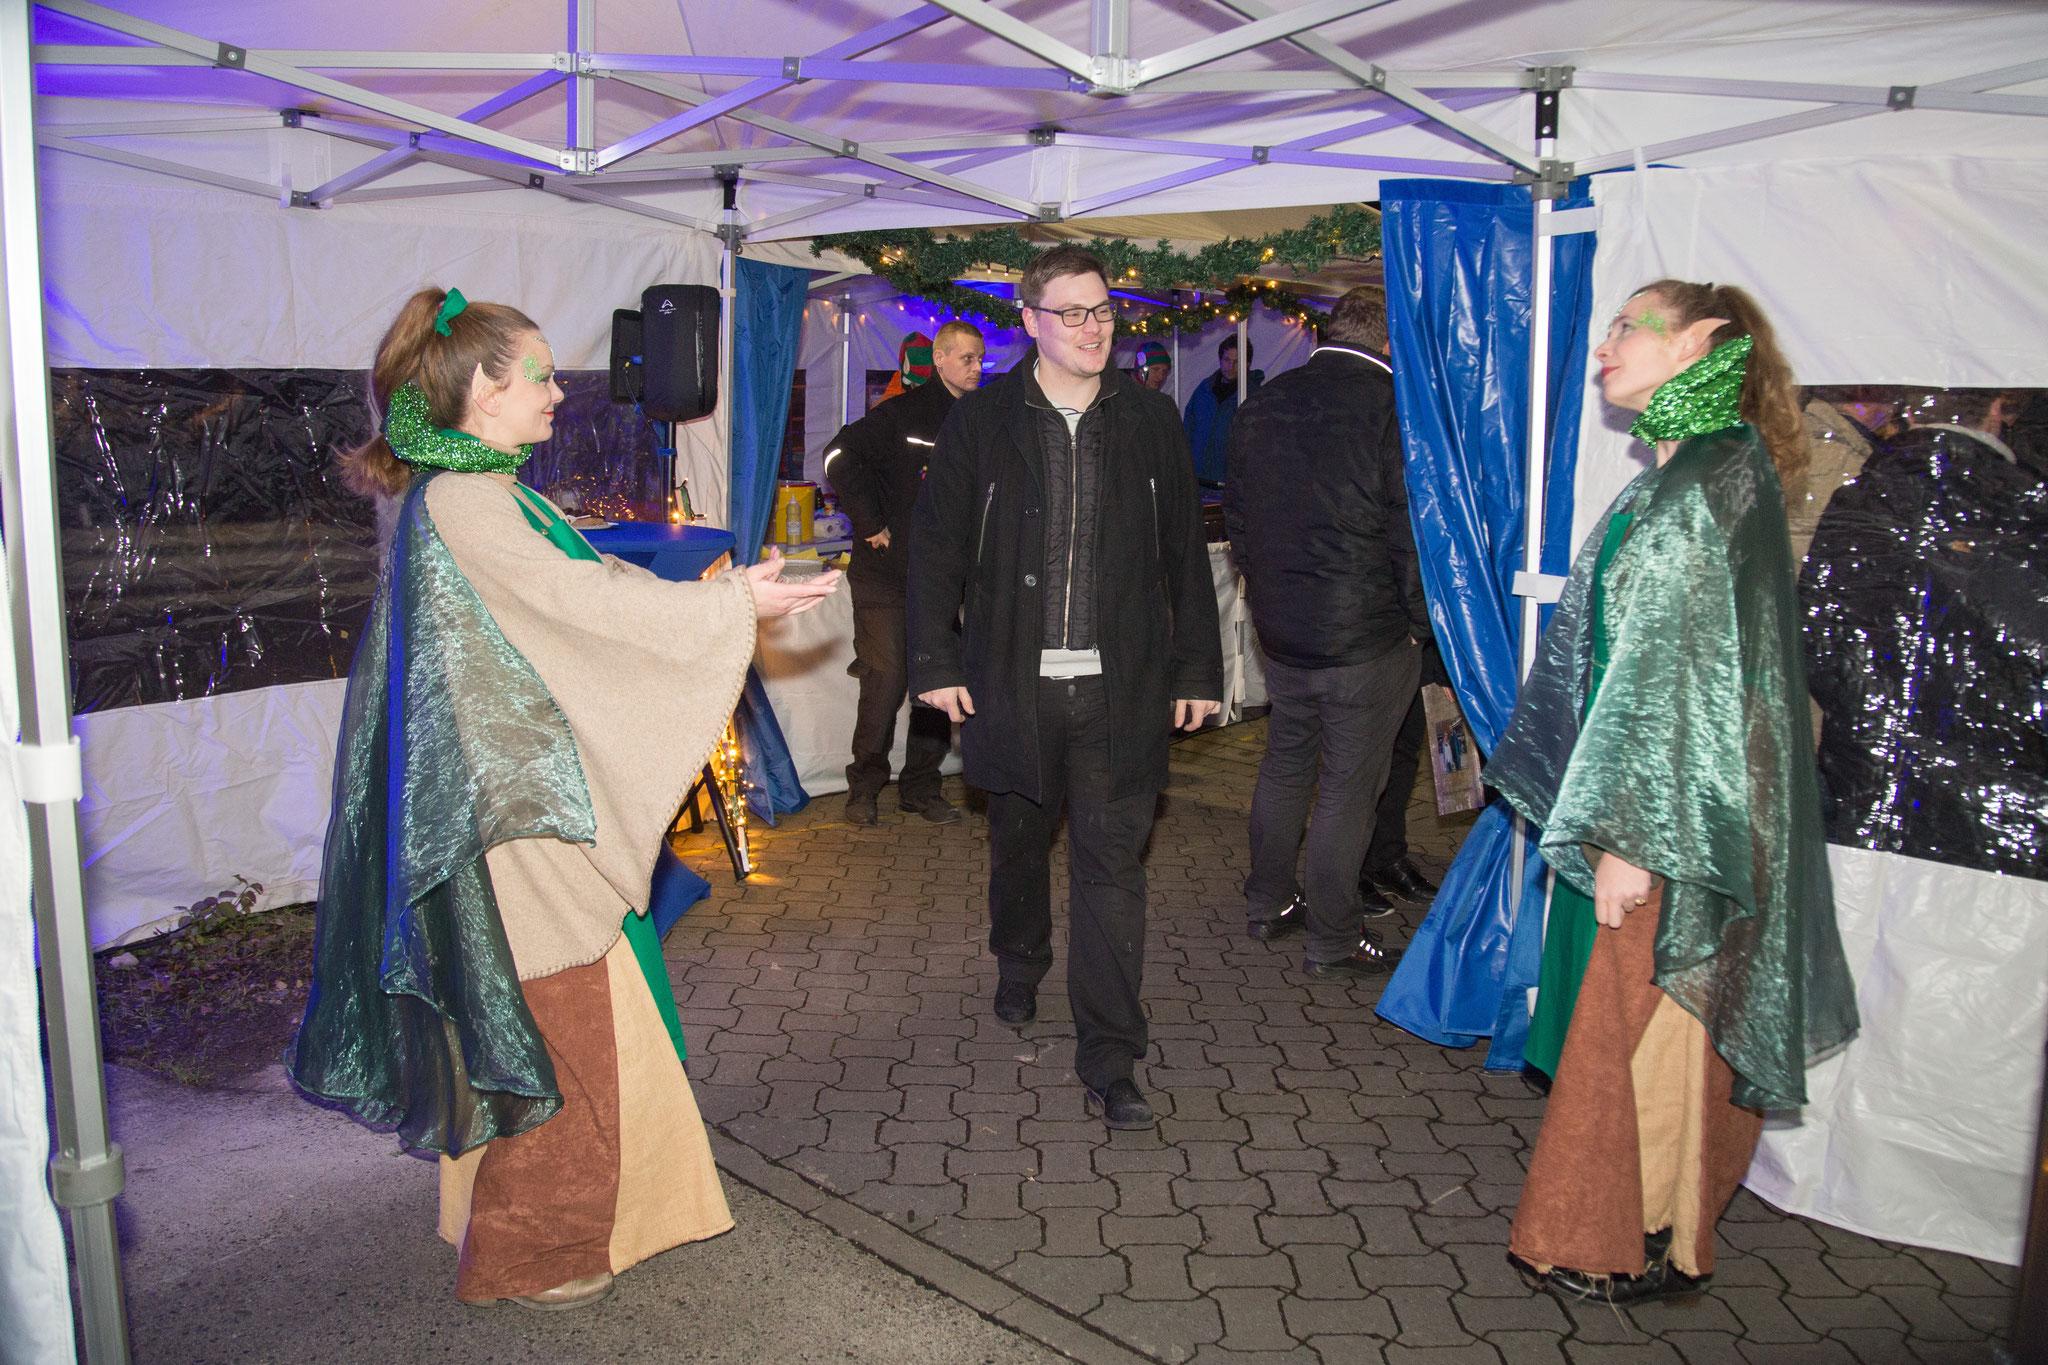 zauberhafte Elfen begrüßen die Gäste